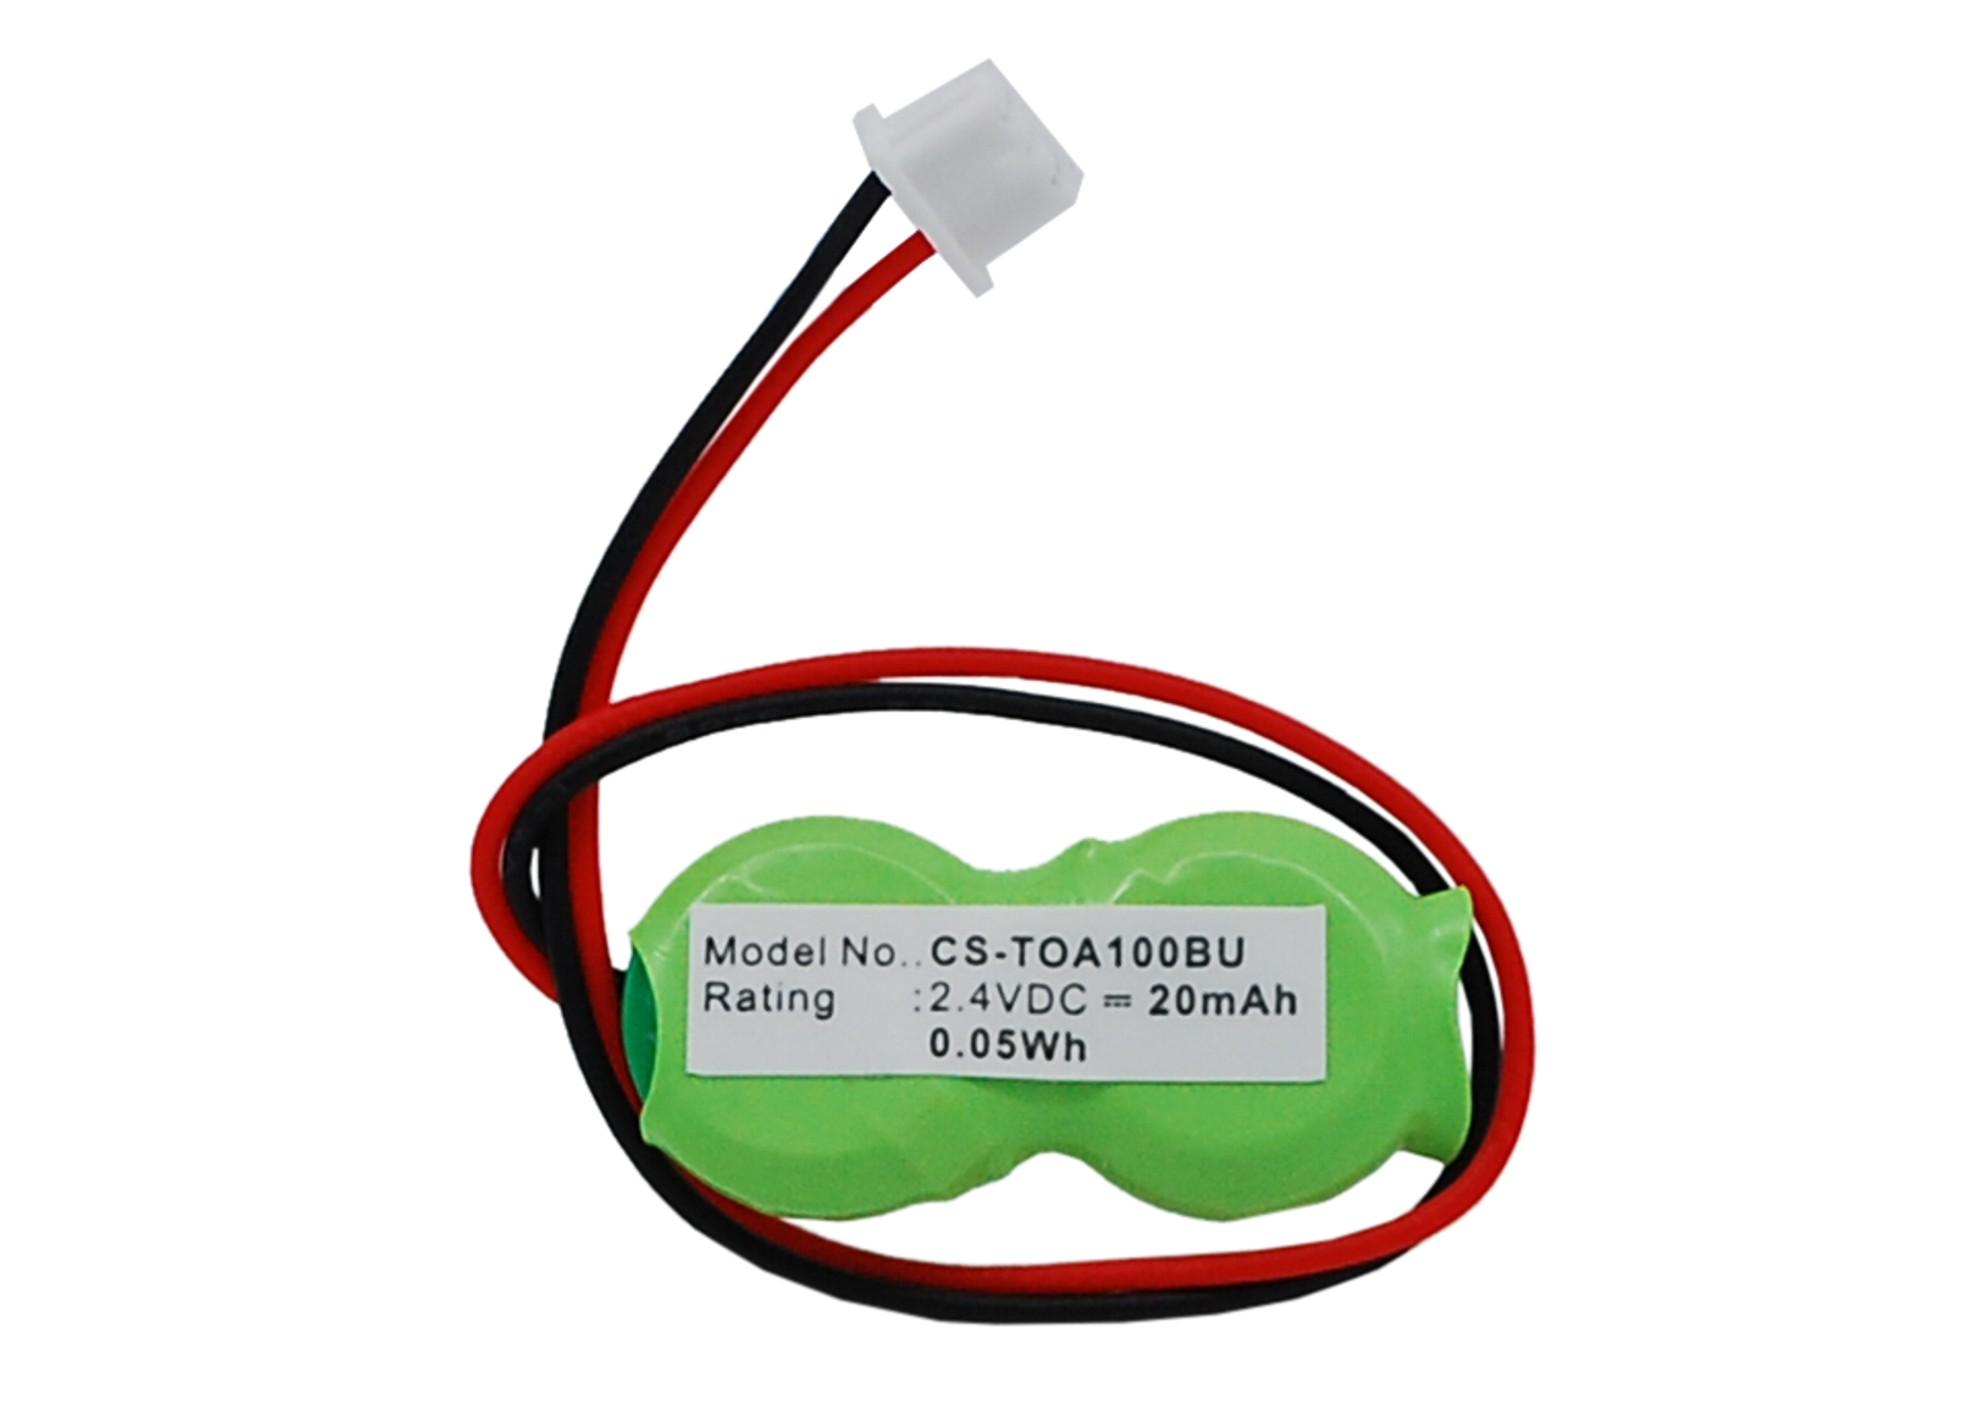 Cameron Sino baterie cmos pro TOSHIBA Portege R600-SP2801C 2.4V Ni-MH 20mAh zelená - neoriginální